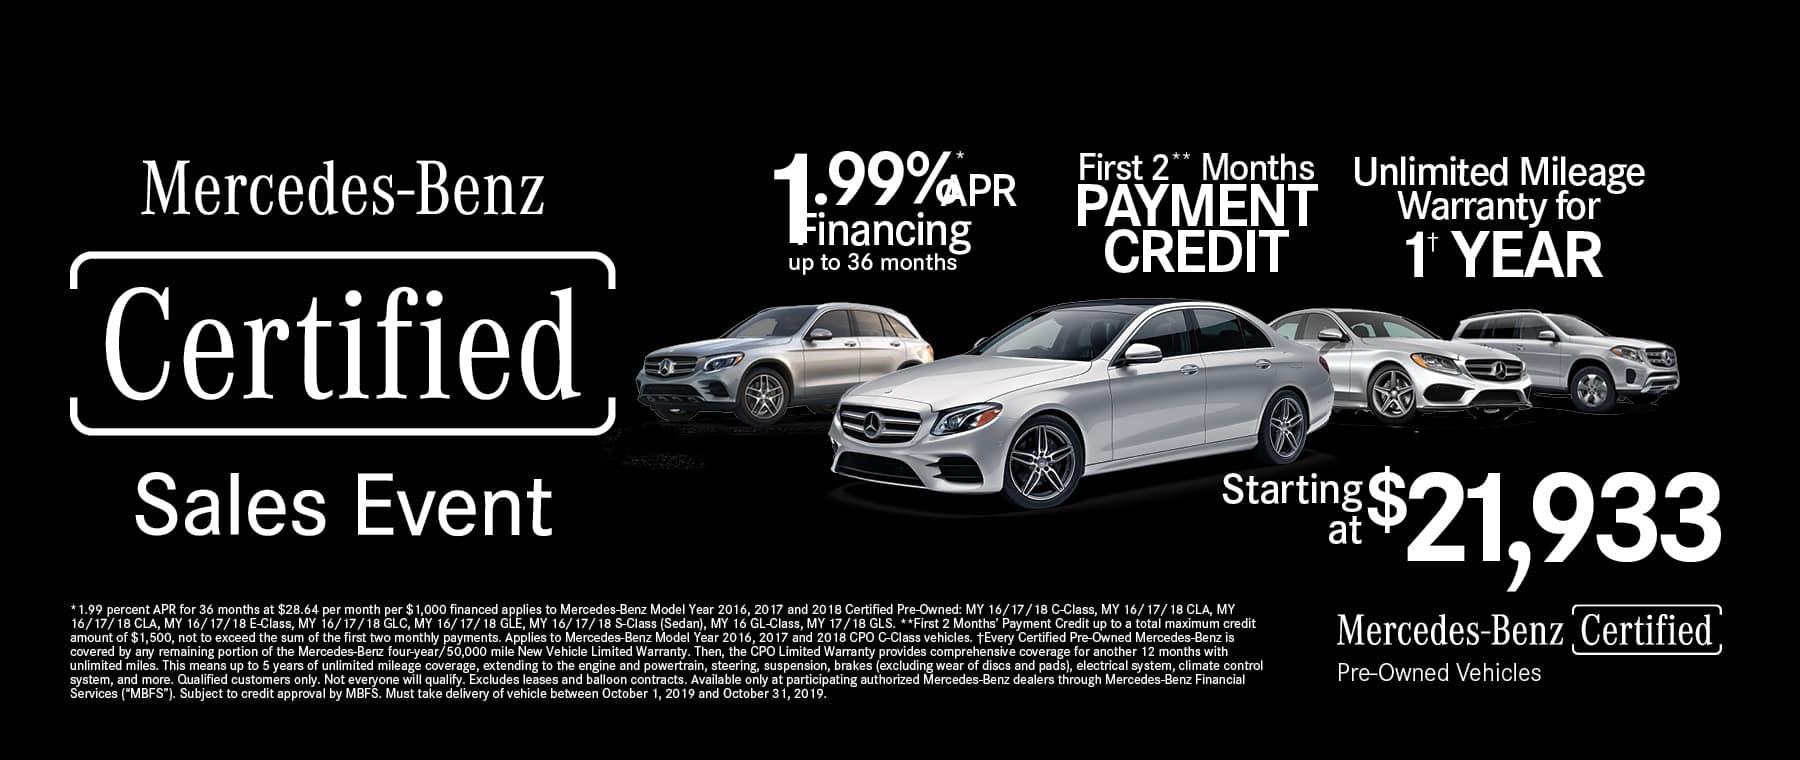 Mercedes Benz Dealers In Nj >> New Mercedes Benz Dealership Philadelphia Cherry Hill Nj